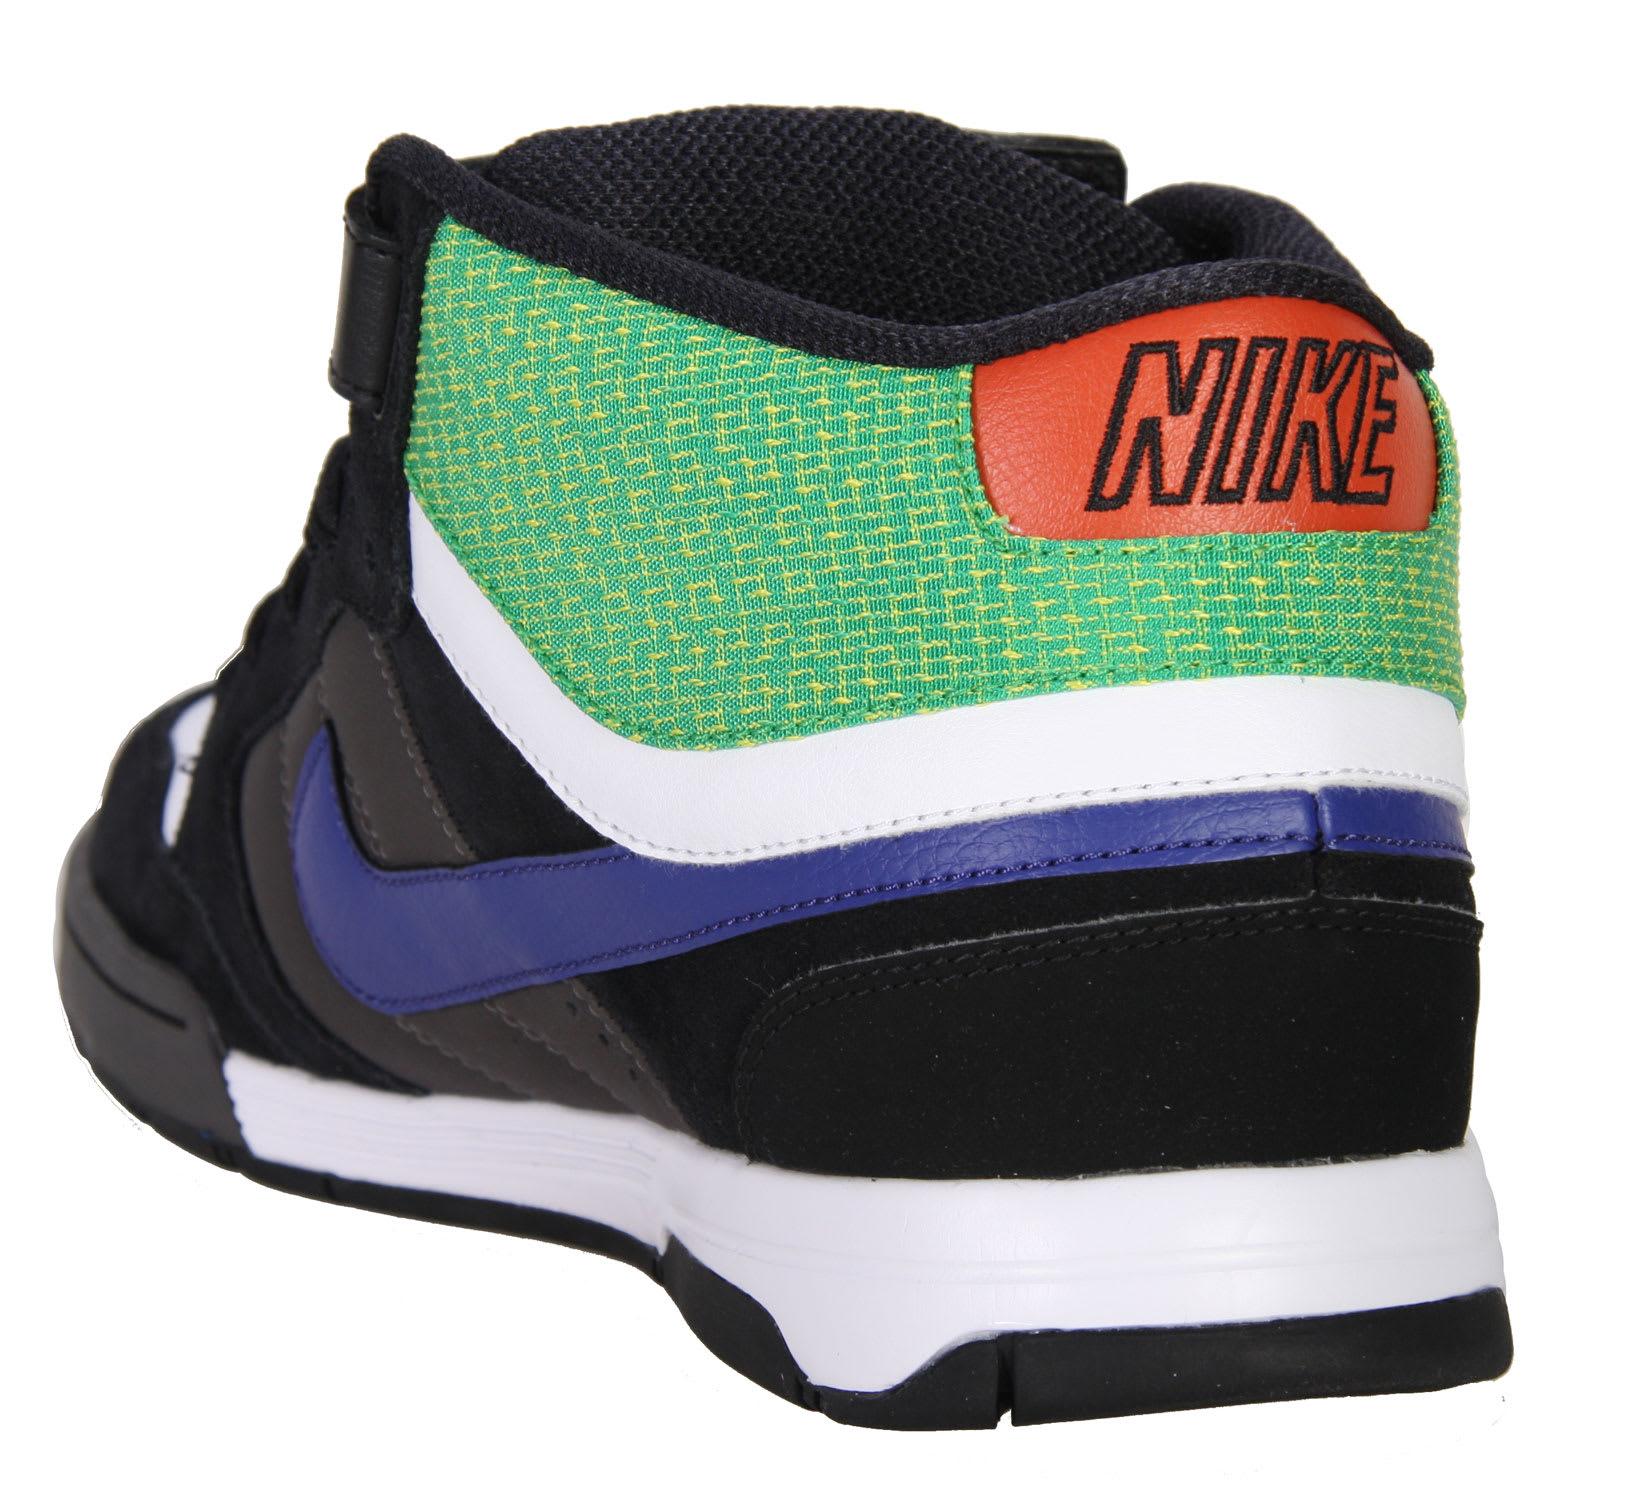 50fa0e264 Nike Air Mogan Mid Skate Shoes - thumbnail 2